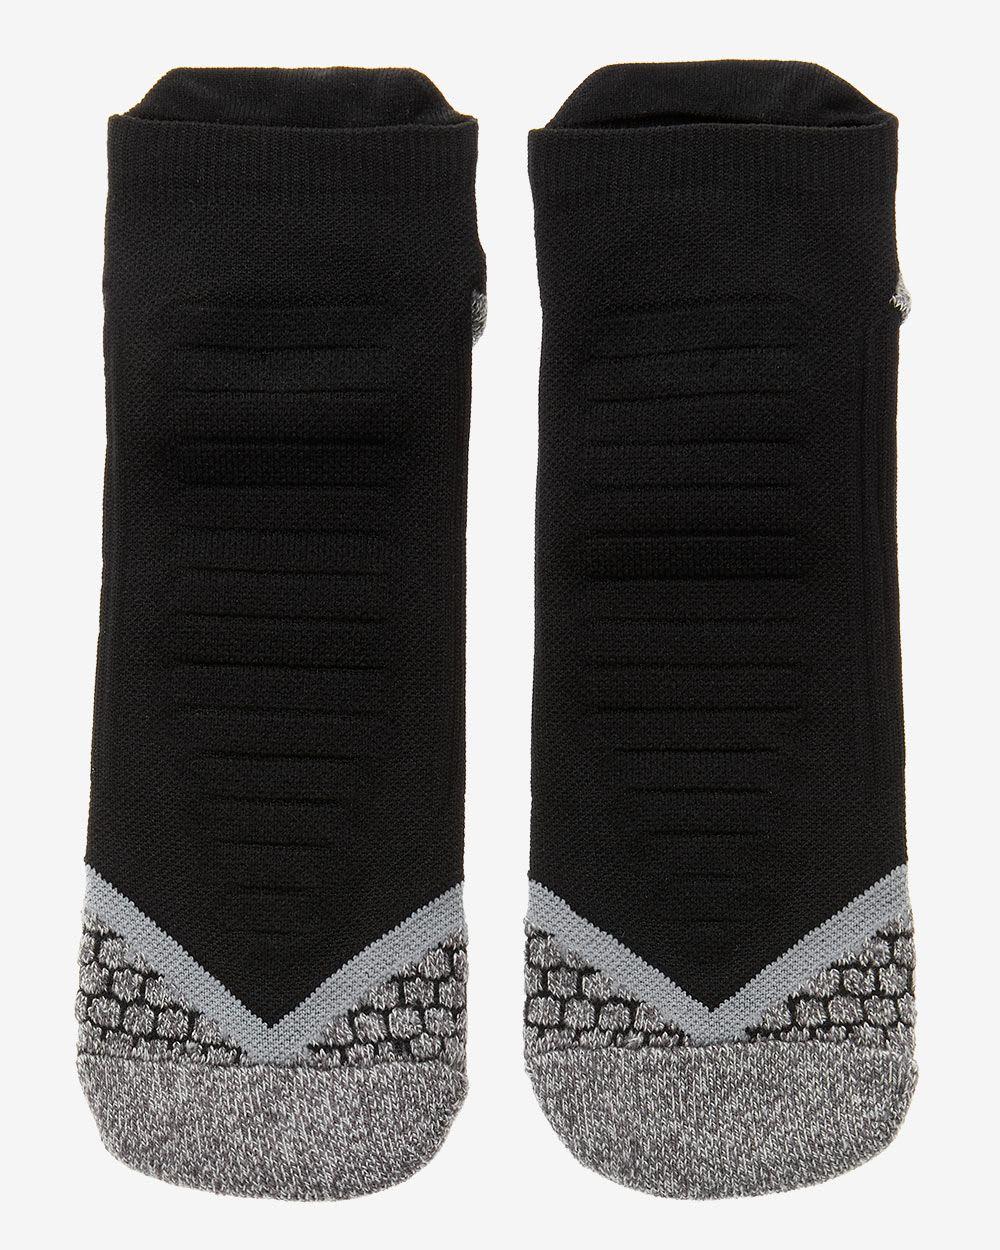 752acbe5a Hyba Running Socks